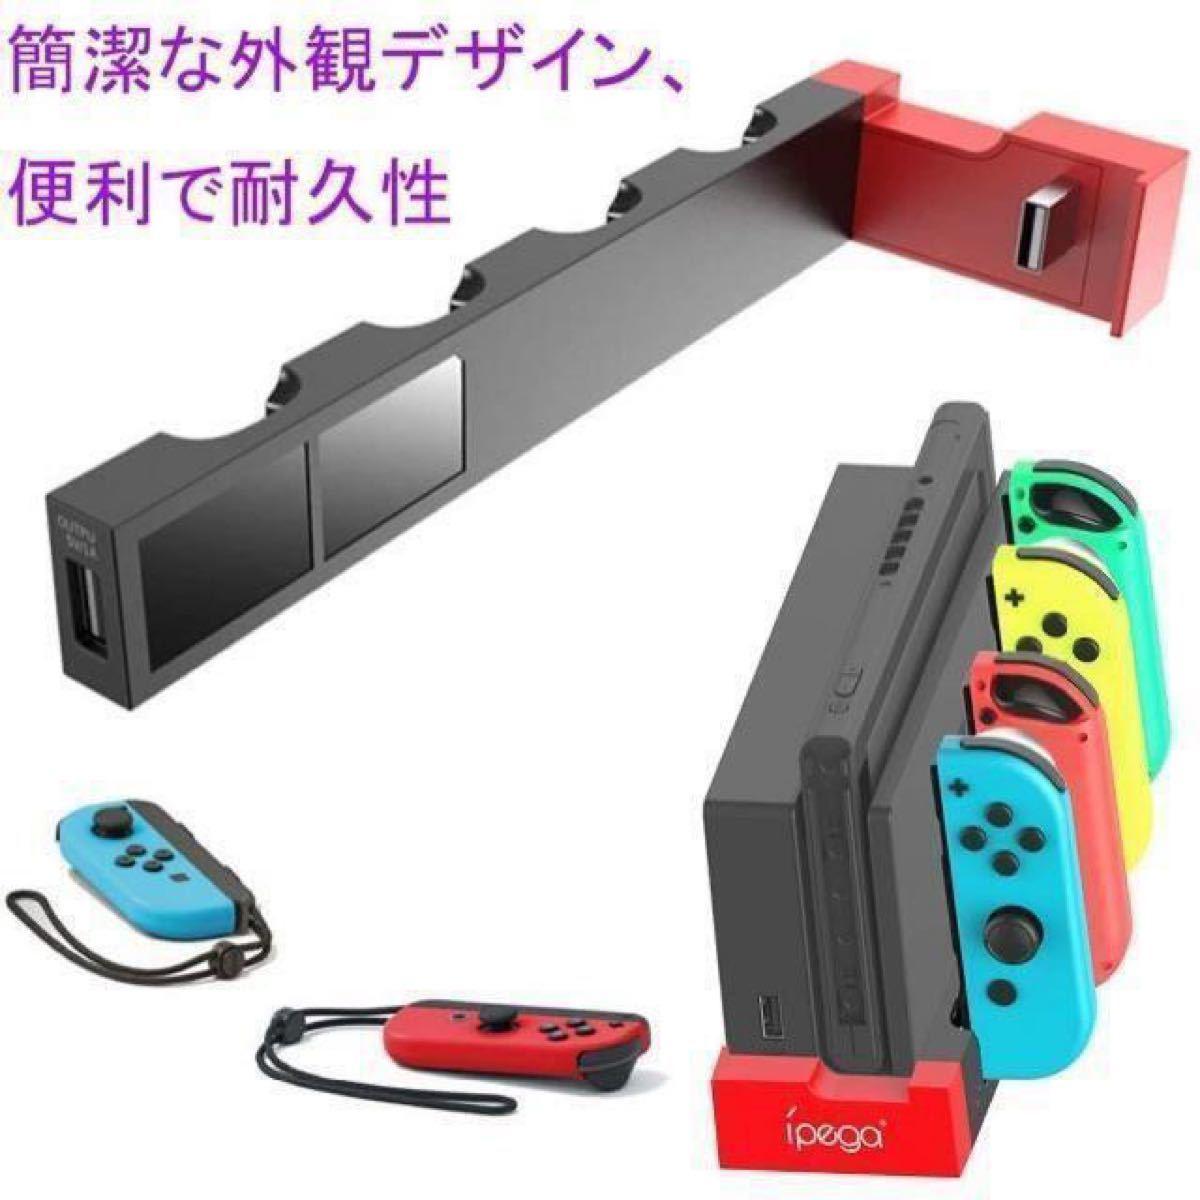 Joy-Con 充電スタンド Nintendo Switch ジョイコン 充電器